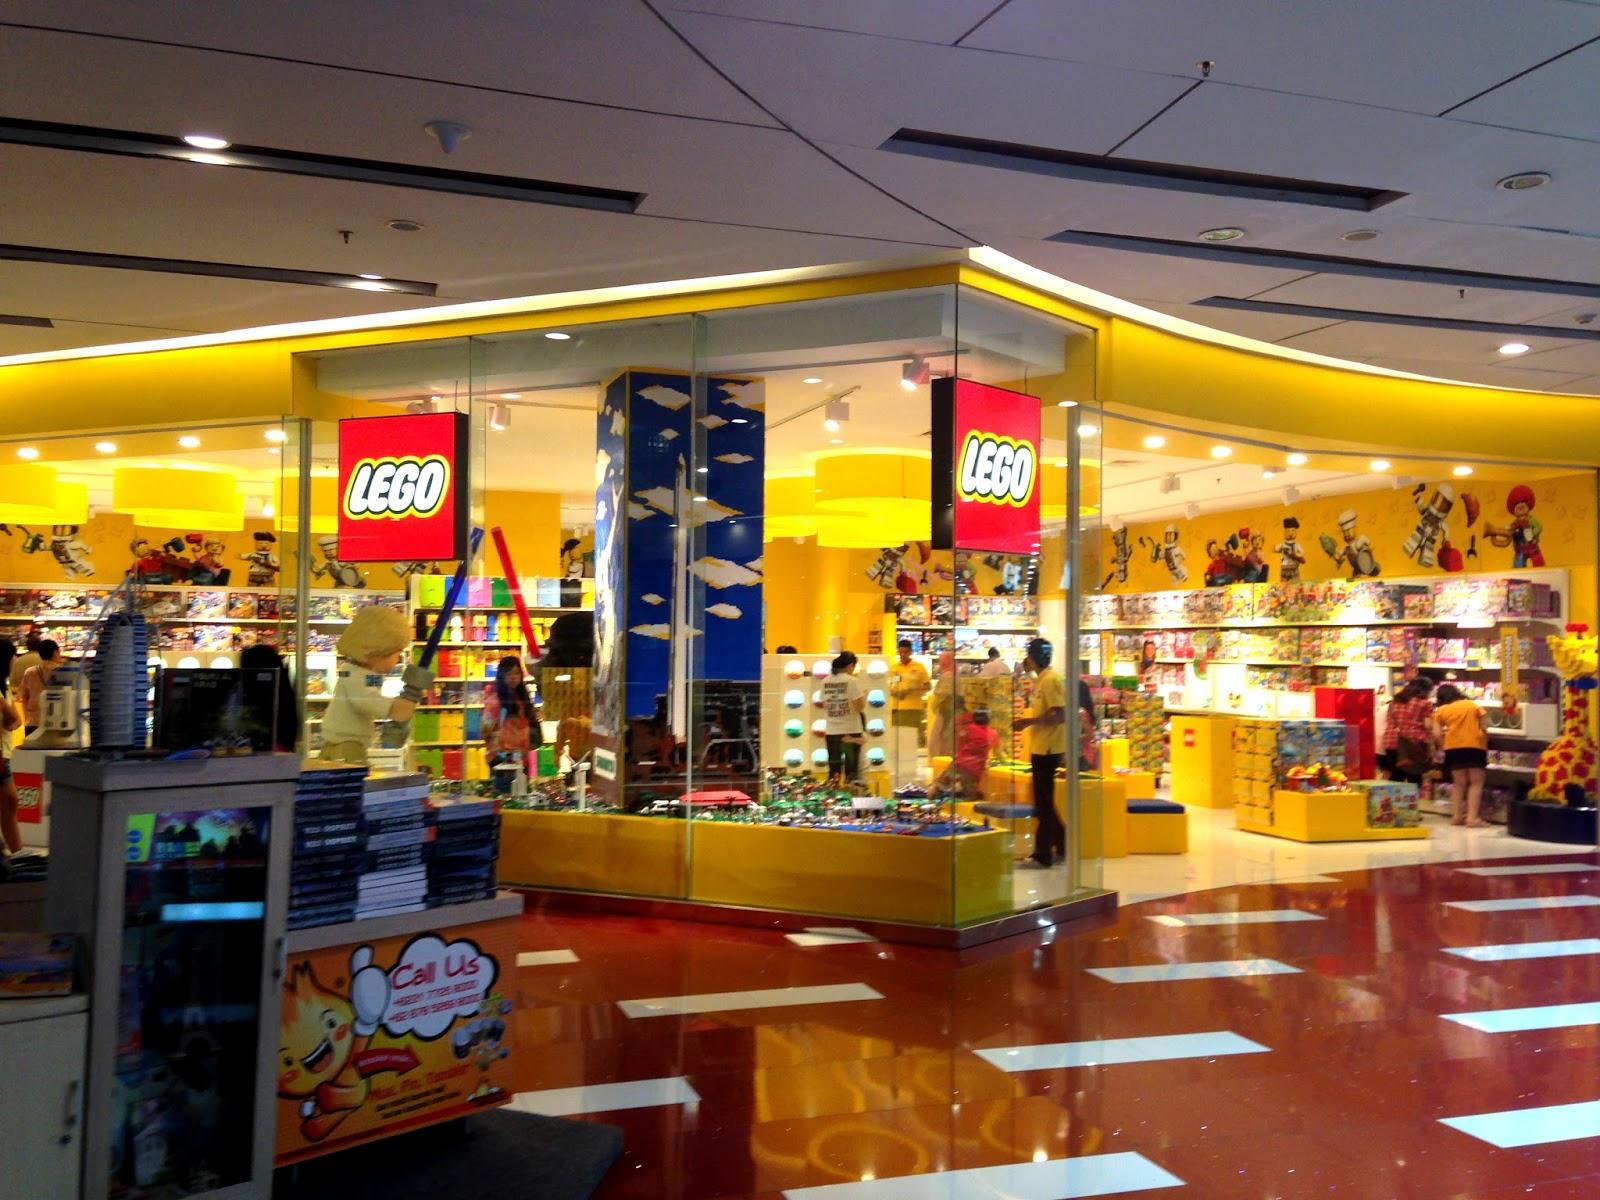 Dedanpe Studio Lego Store Grand City Mall Surabaya